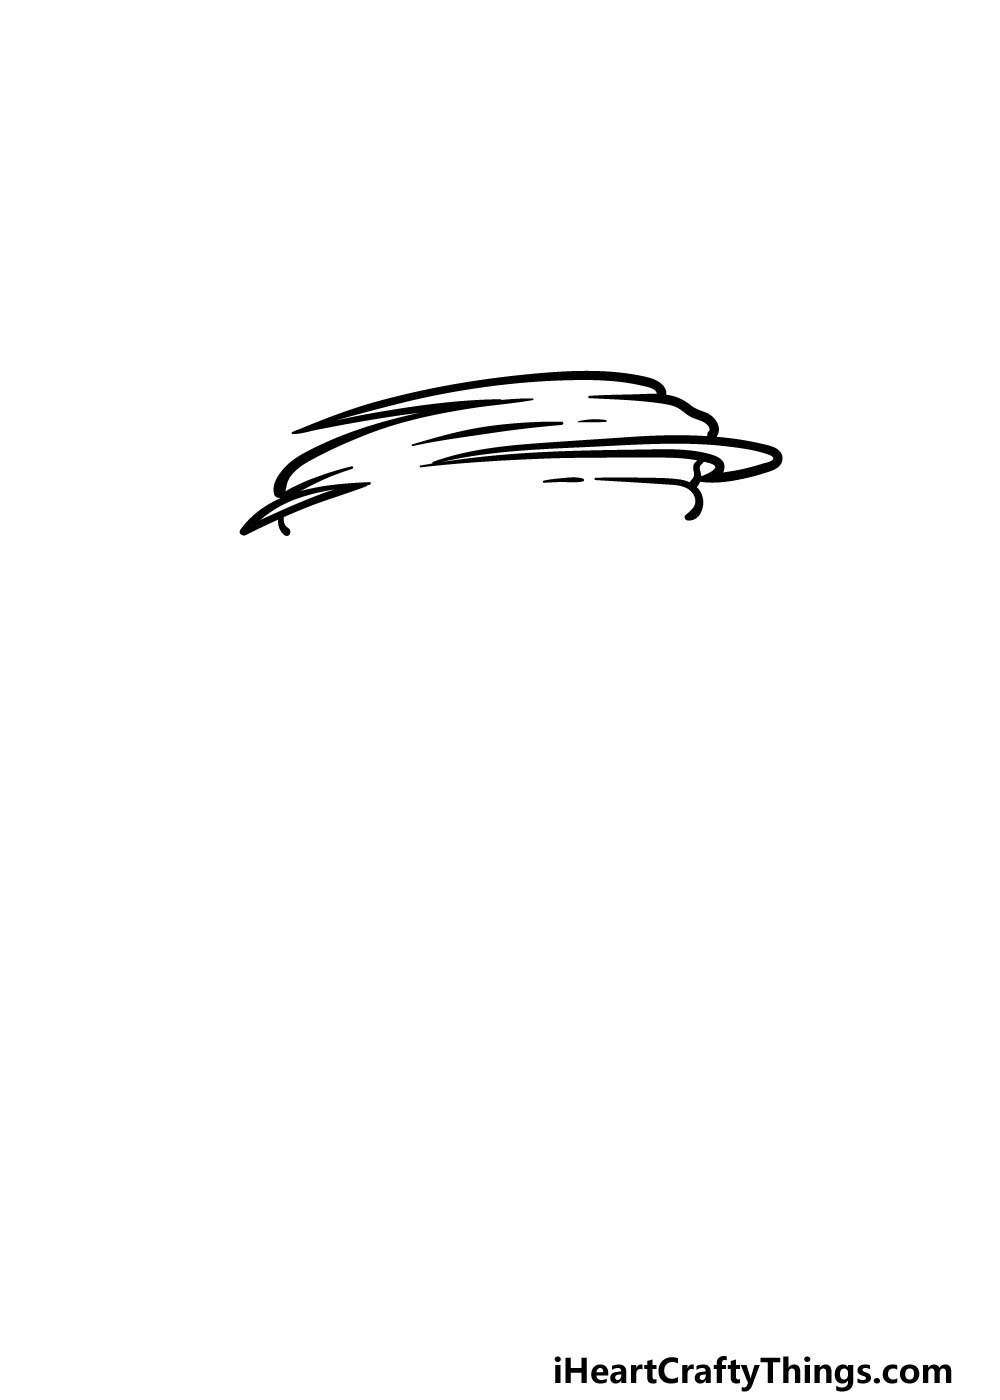 drawing a tornado step 1